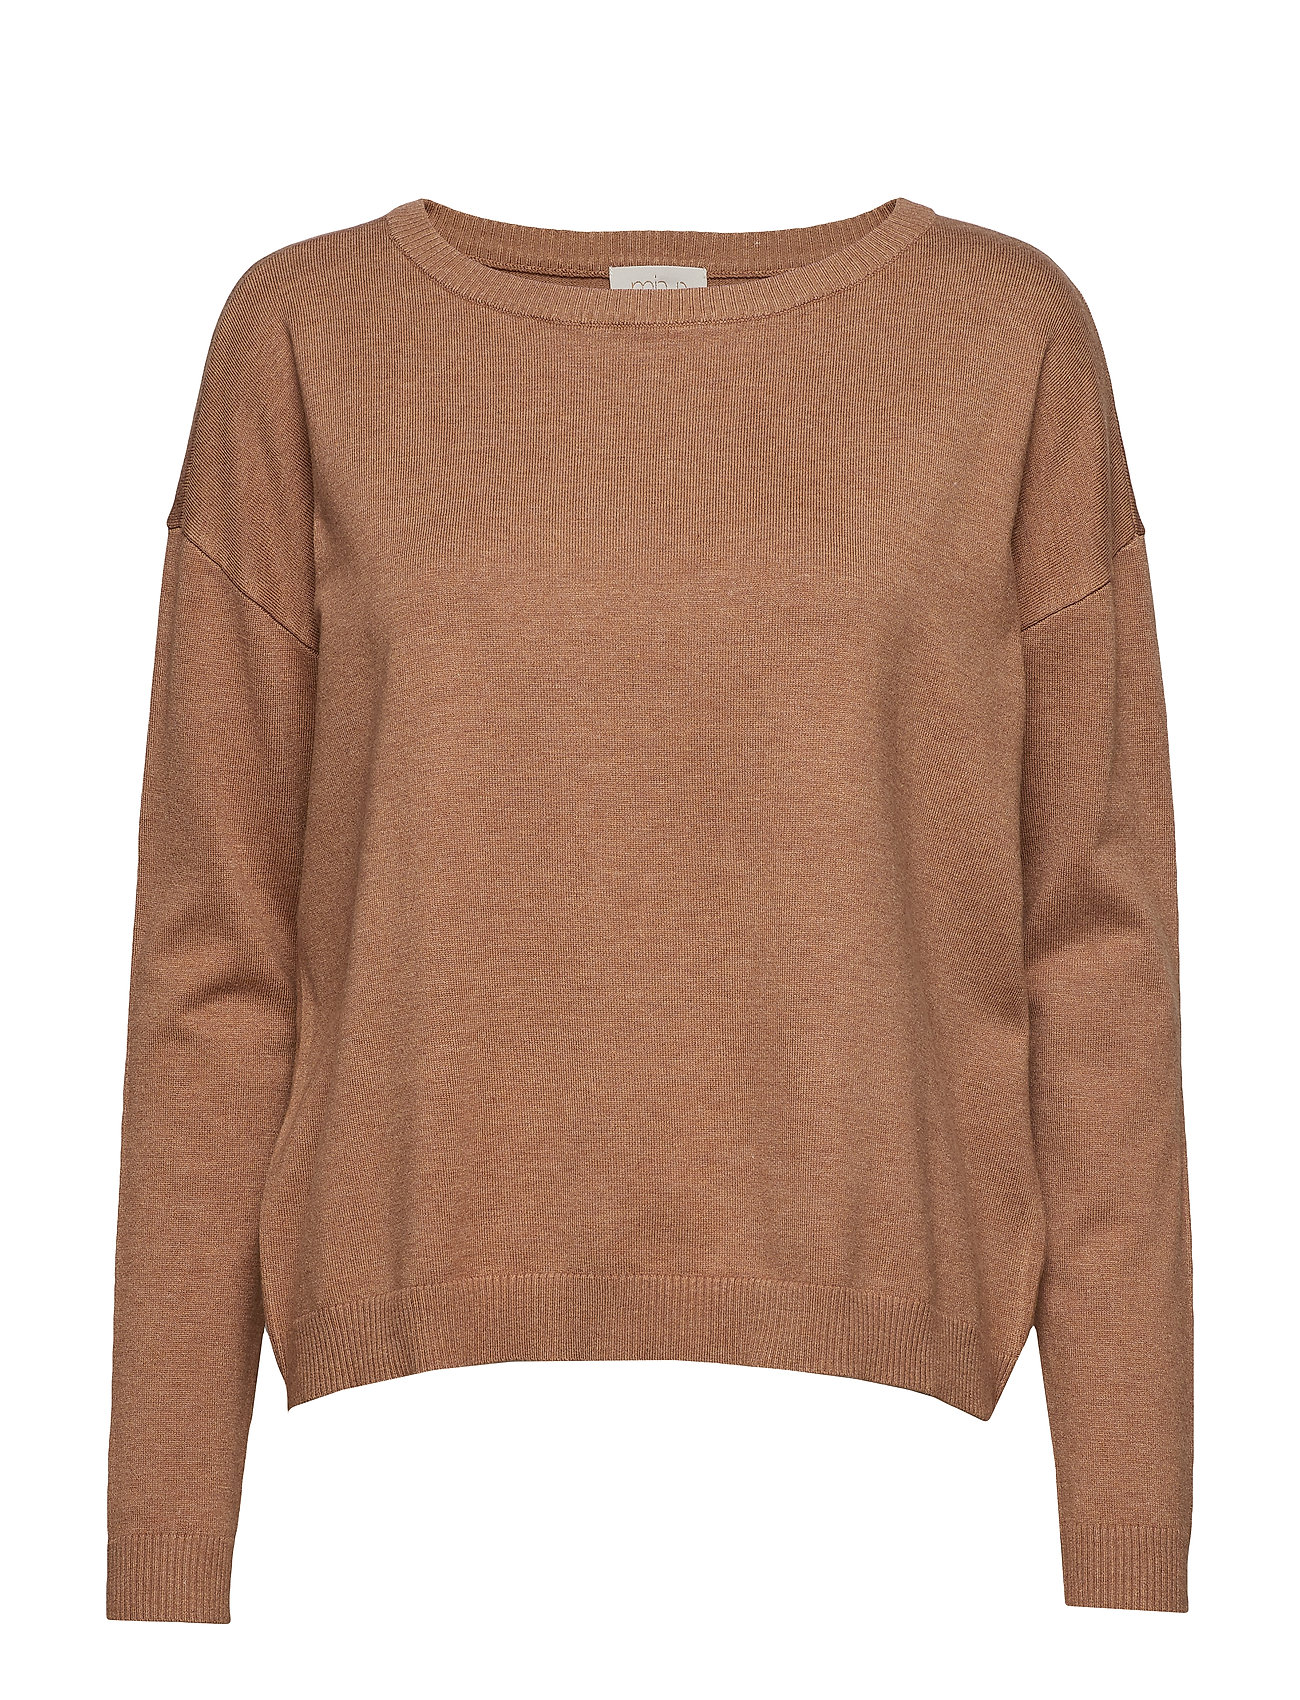 Minus Elne knit - TOBACCO MELANGE